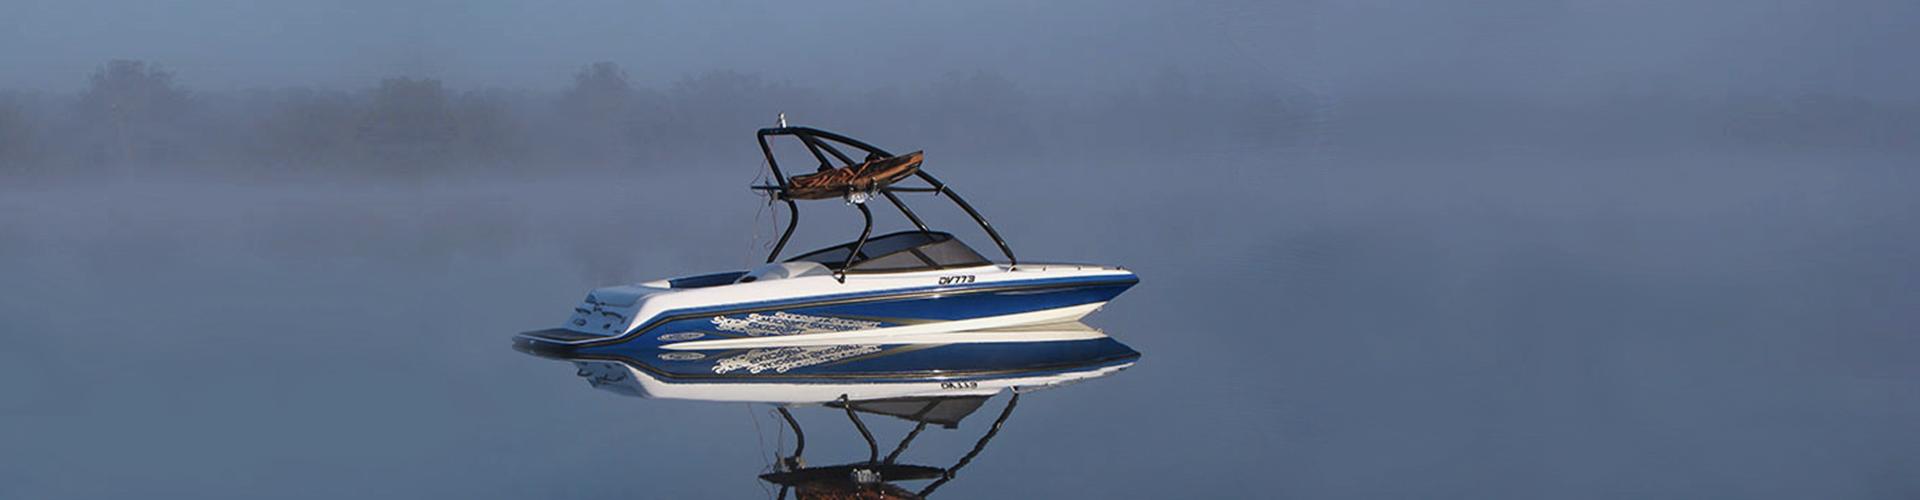 Skicraft Boats